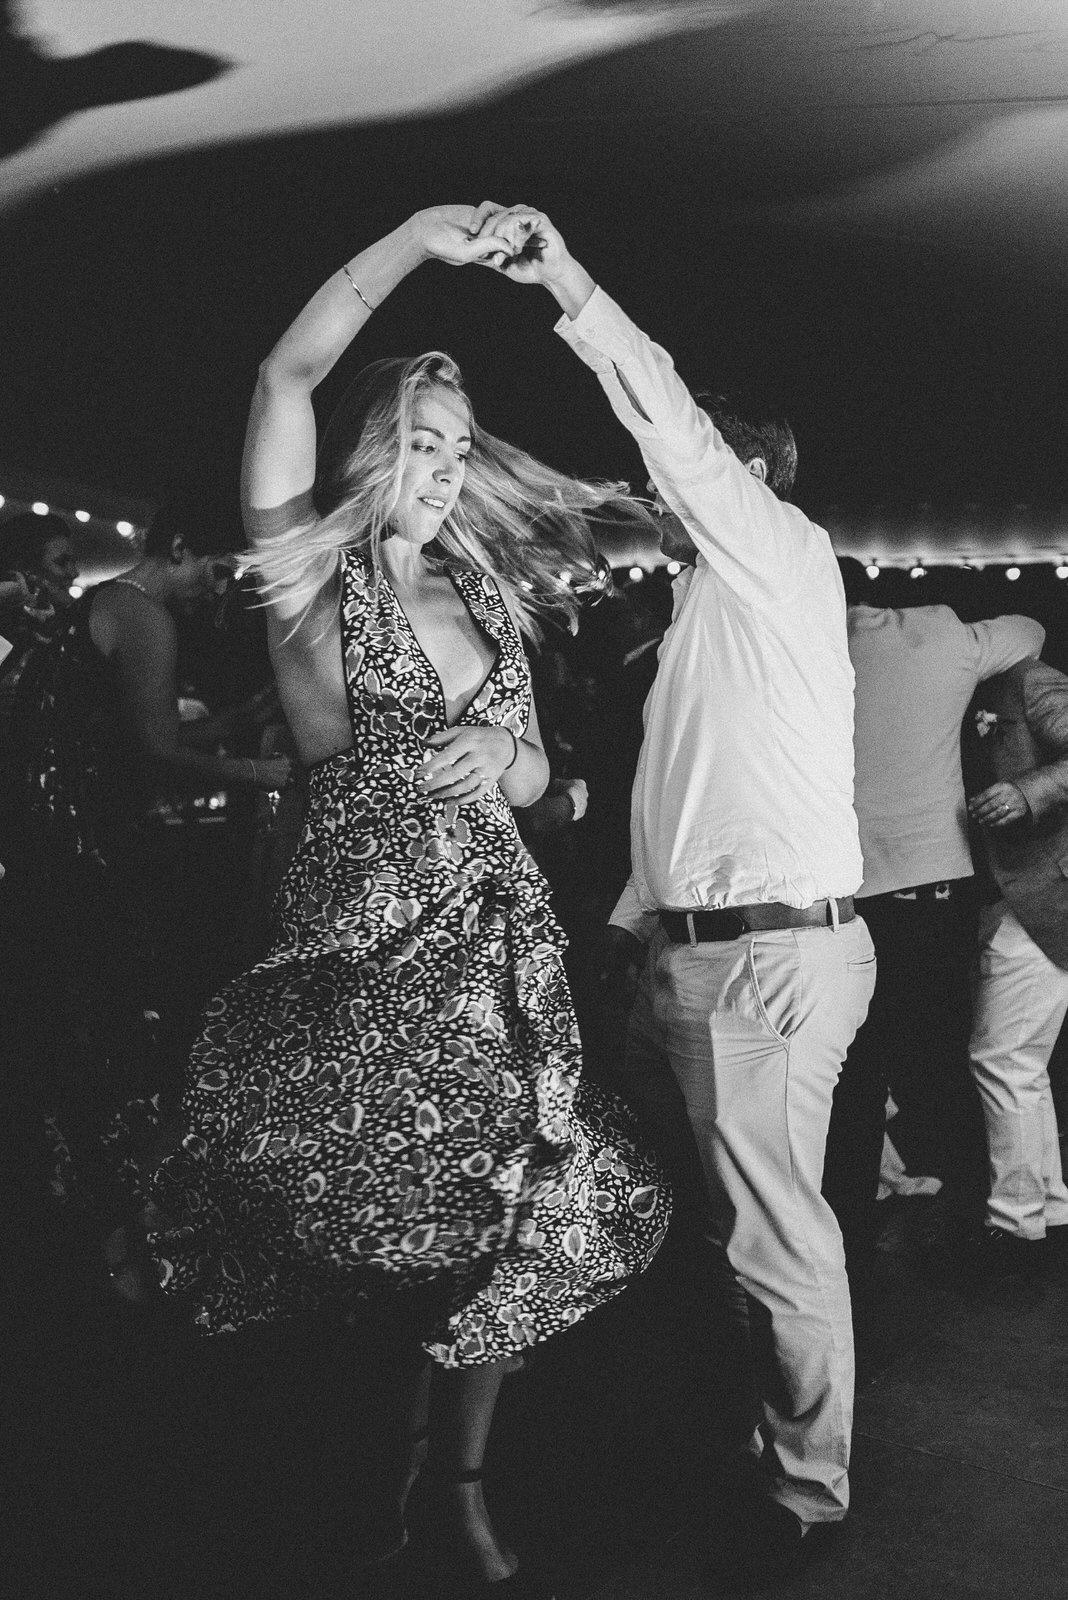 043-LOURMARIN-WEDDING-PHOTOGRAPHER-PROVENCE-WEDDING-ALTERNATIVE-WEDDING-PHOTOGRAPHY-FRANCE-PROVENCE-GARDEN-WEDDING.JPG